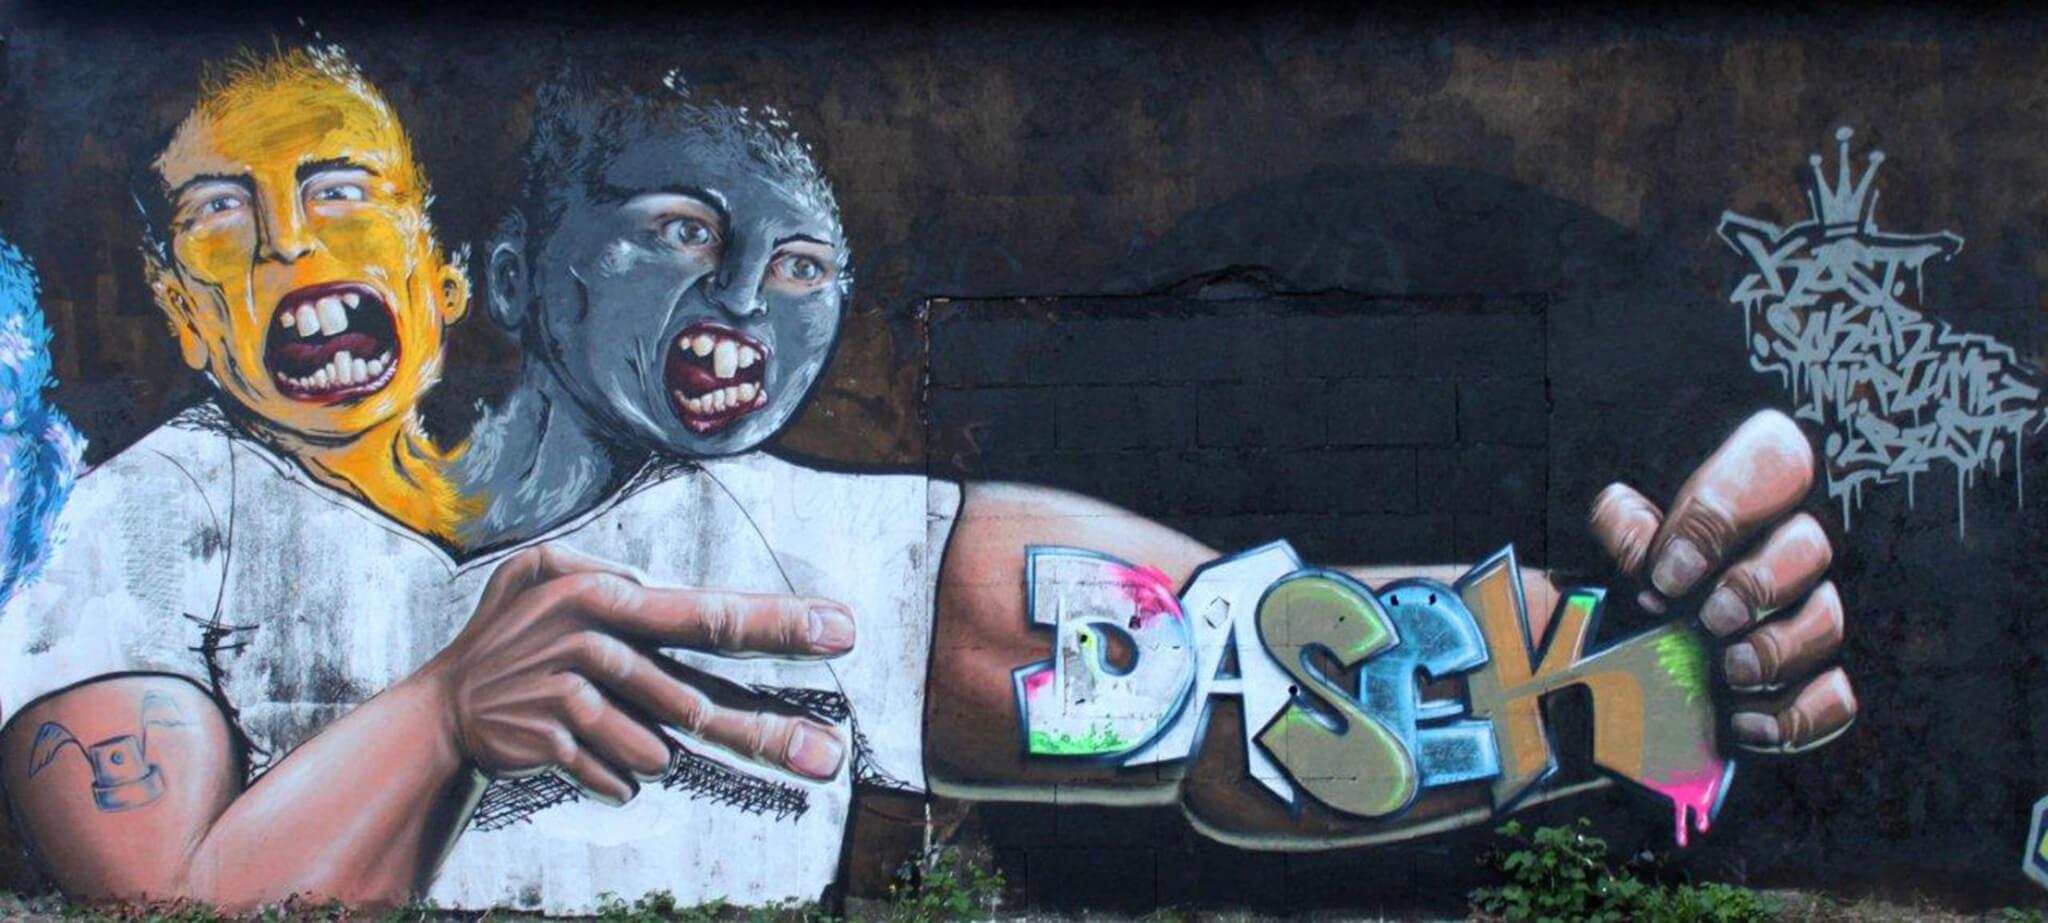 """unsymetric twins"" - Max Kosta, Sokar Uno, Mr. Plume / Tours (FR)2010"